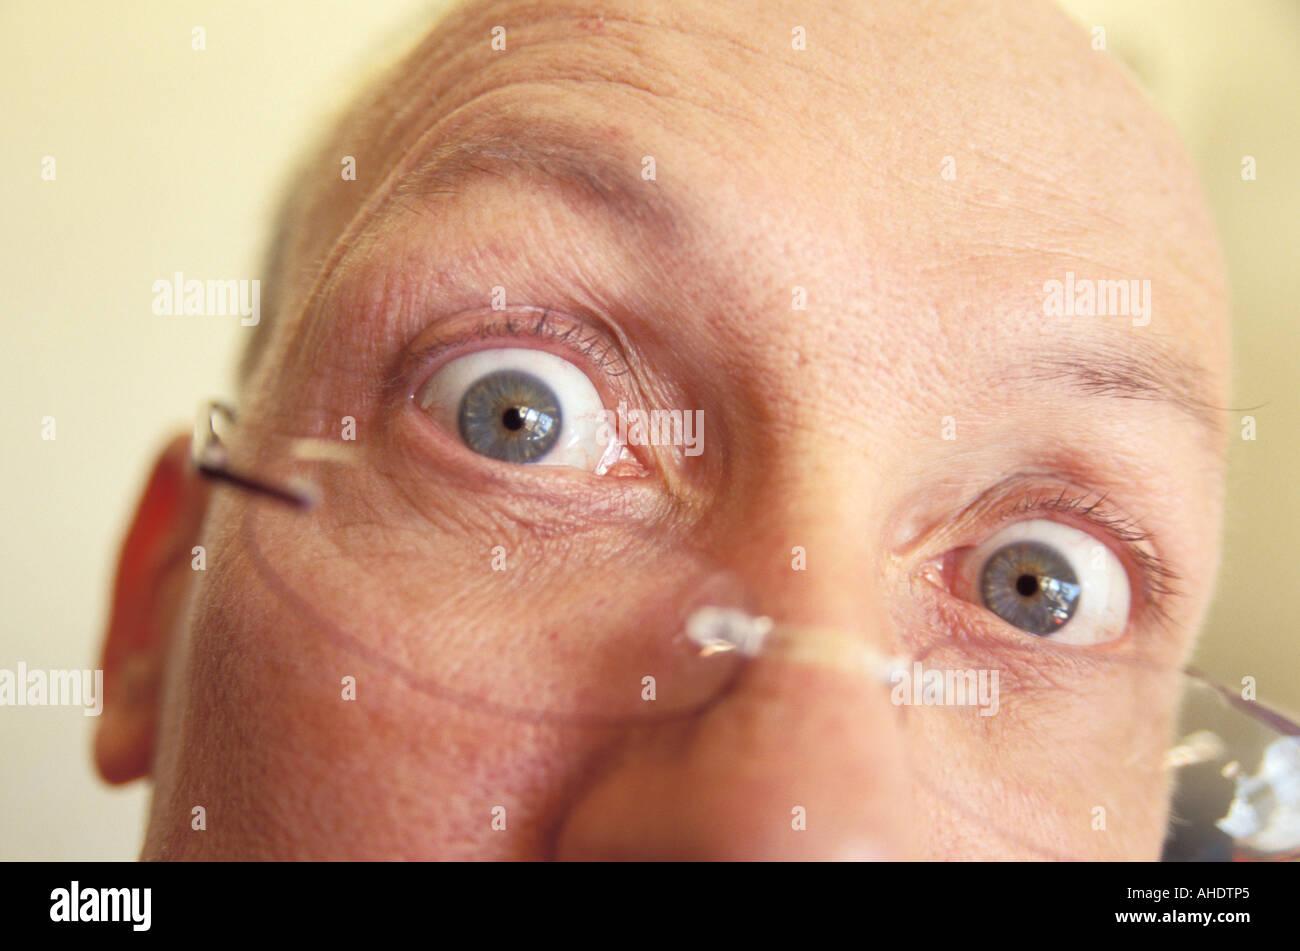 Man s Eyes Wide Open - Stock Image